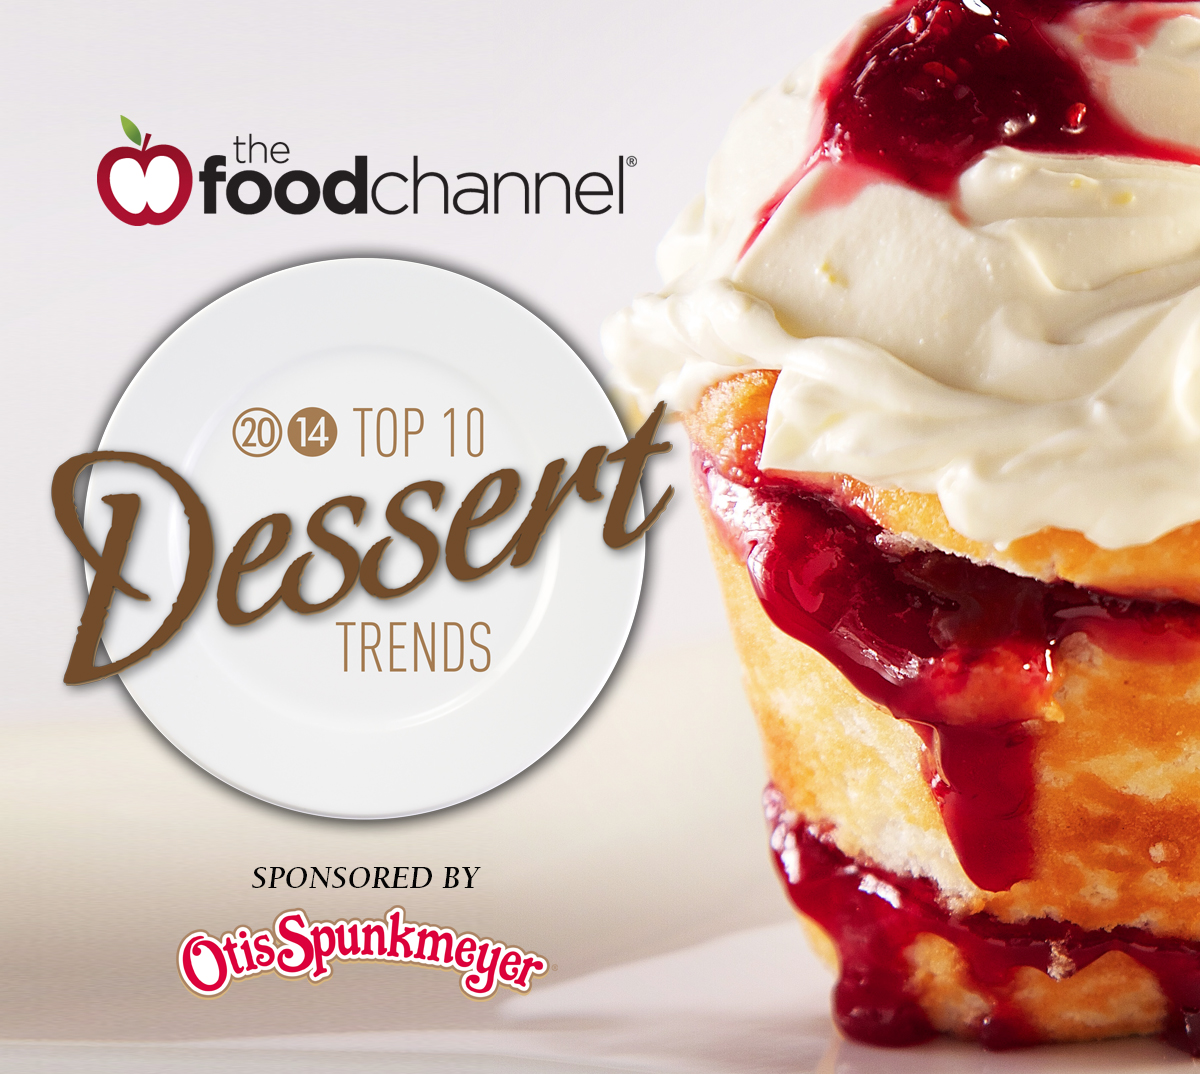 FoodChannel.com Announces Its 2014 Top Ten Dessert Trend | Roaming ...